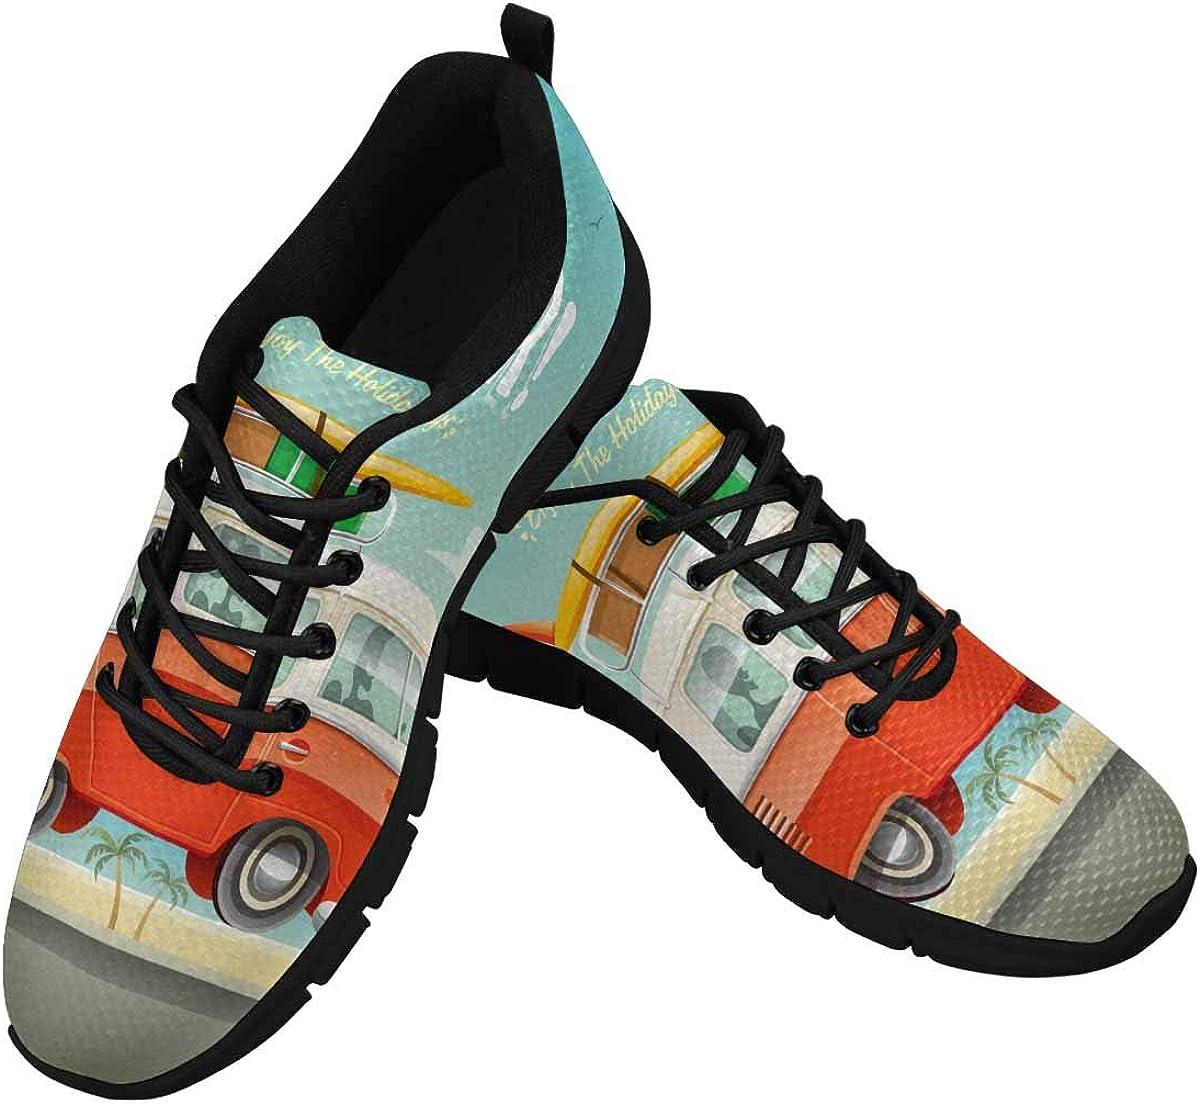 INTERESTPRINT OFFicial Hello Summer Camper Van Walking Ligh Shoes Nippon regular agency Women's